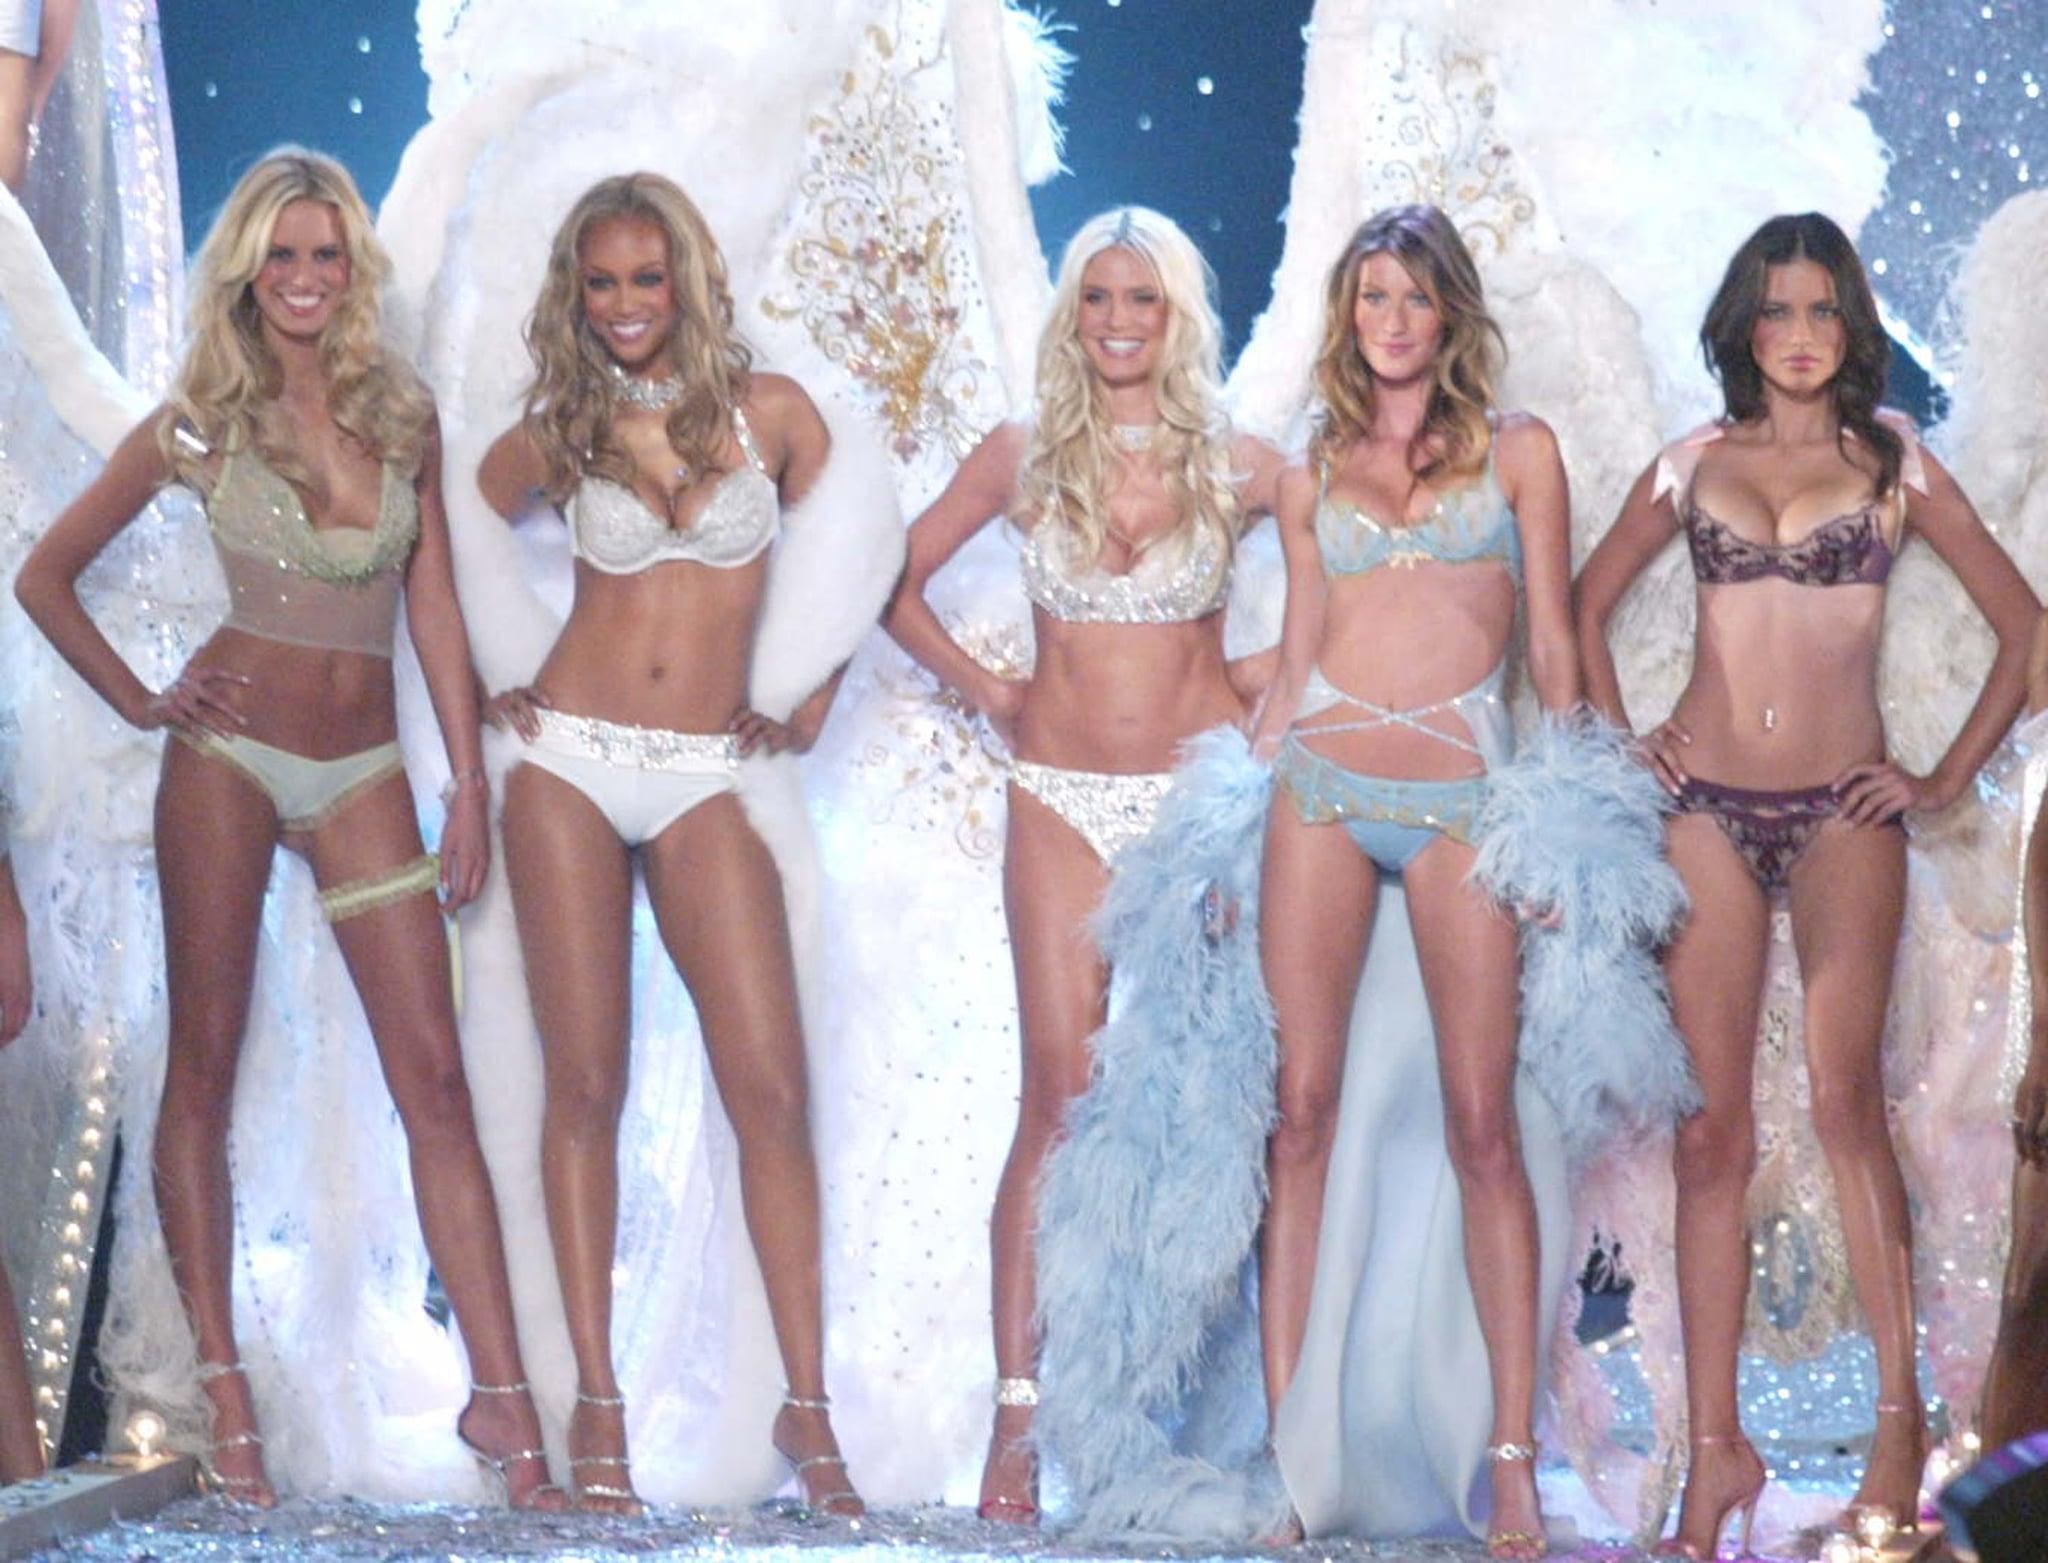 Karolina Kurkova, Tyra Banks, Heidi Klum, Gisele Bundchen, and Adriana Lima stood strong during the 2003 runway finale.